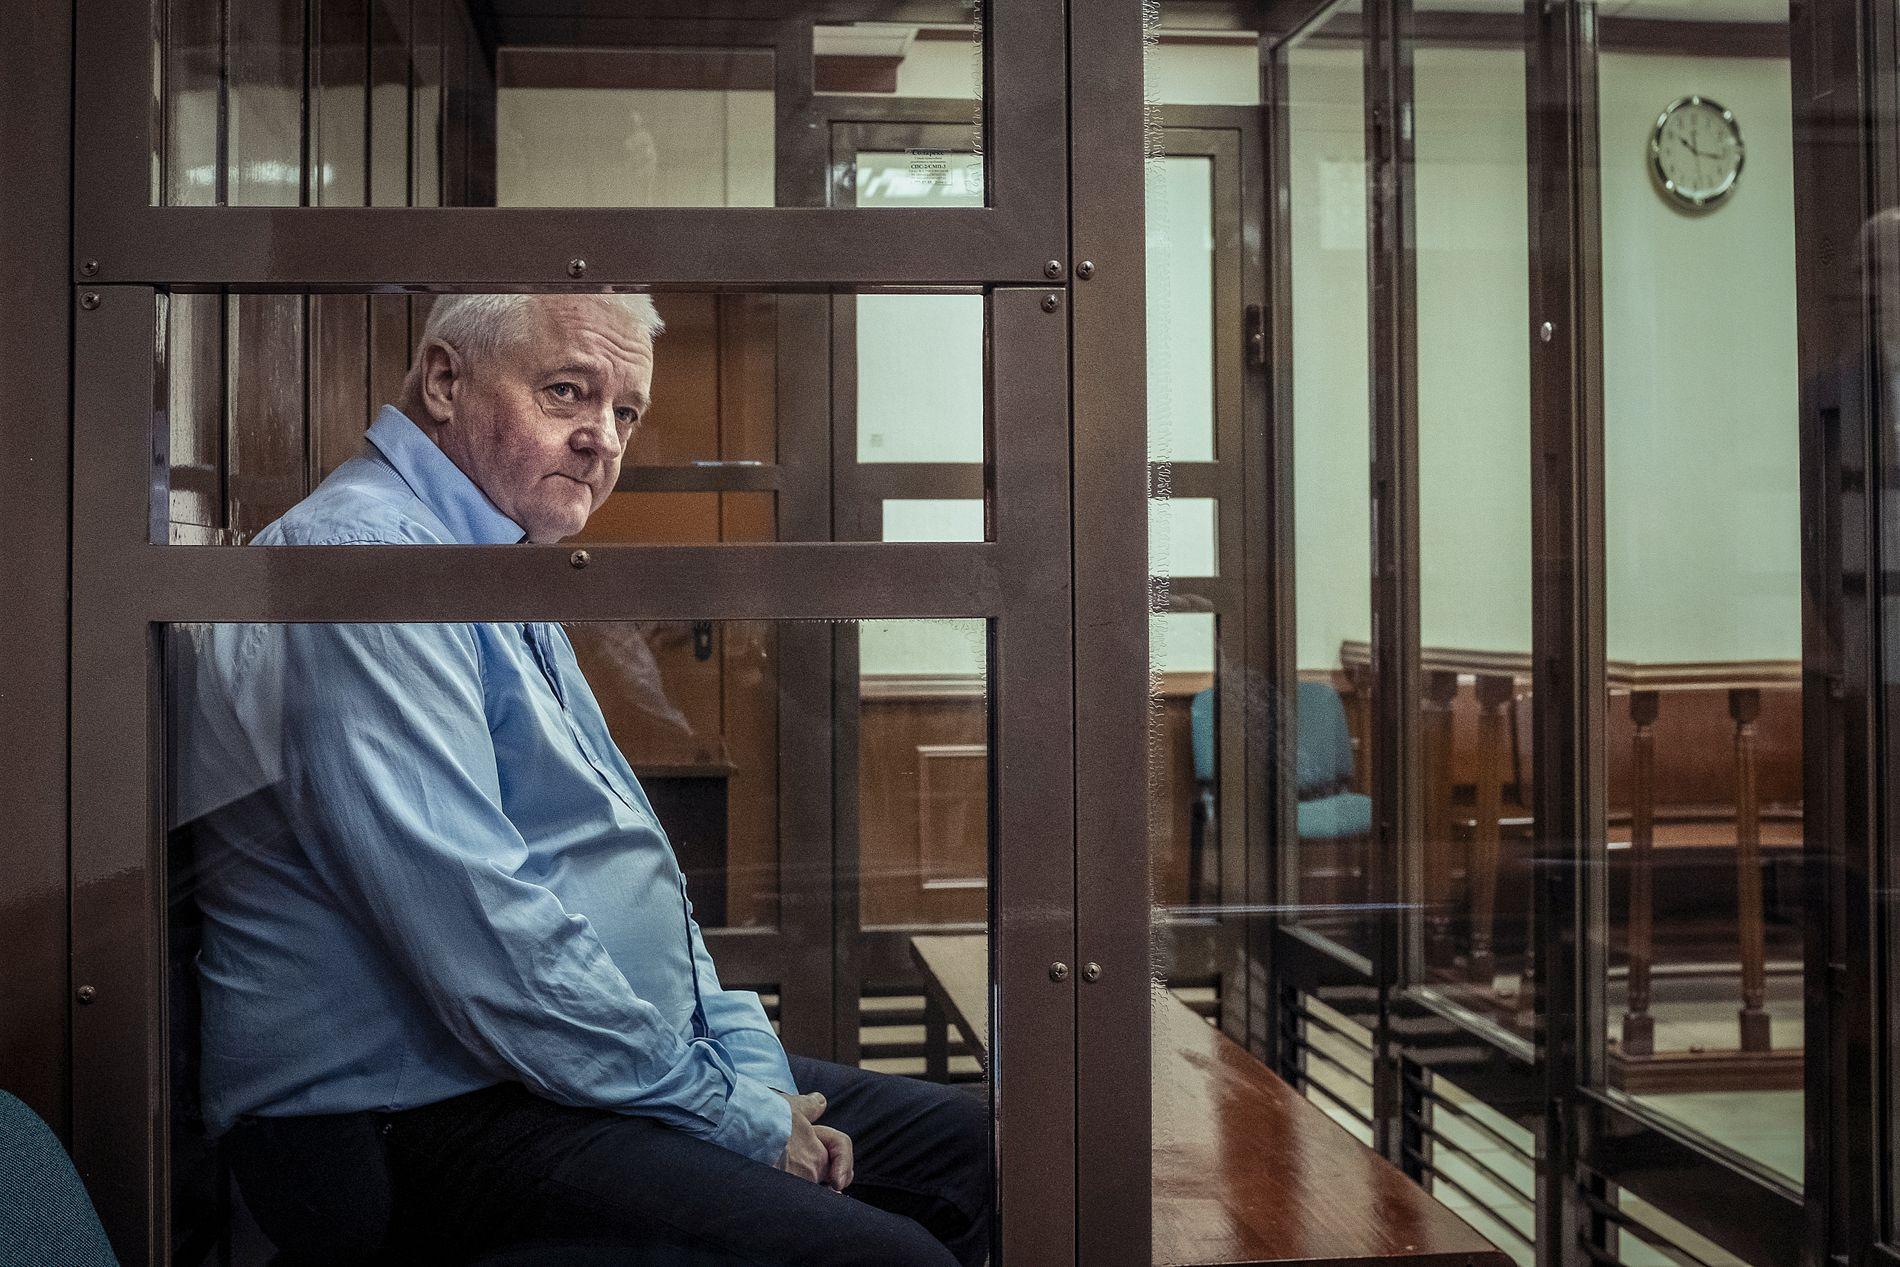 KAN FÅ DOM TIRSDAG: Frode Berg har sittet i varetekt i halvannet år, tirsdag kan han få sin dom.